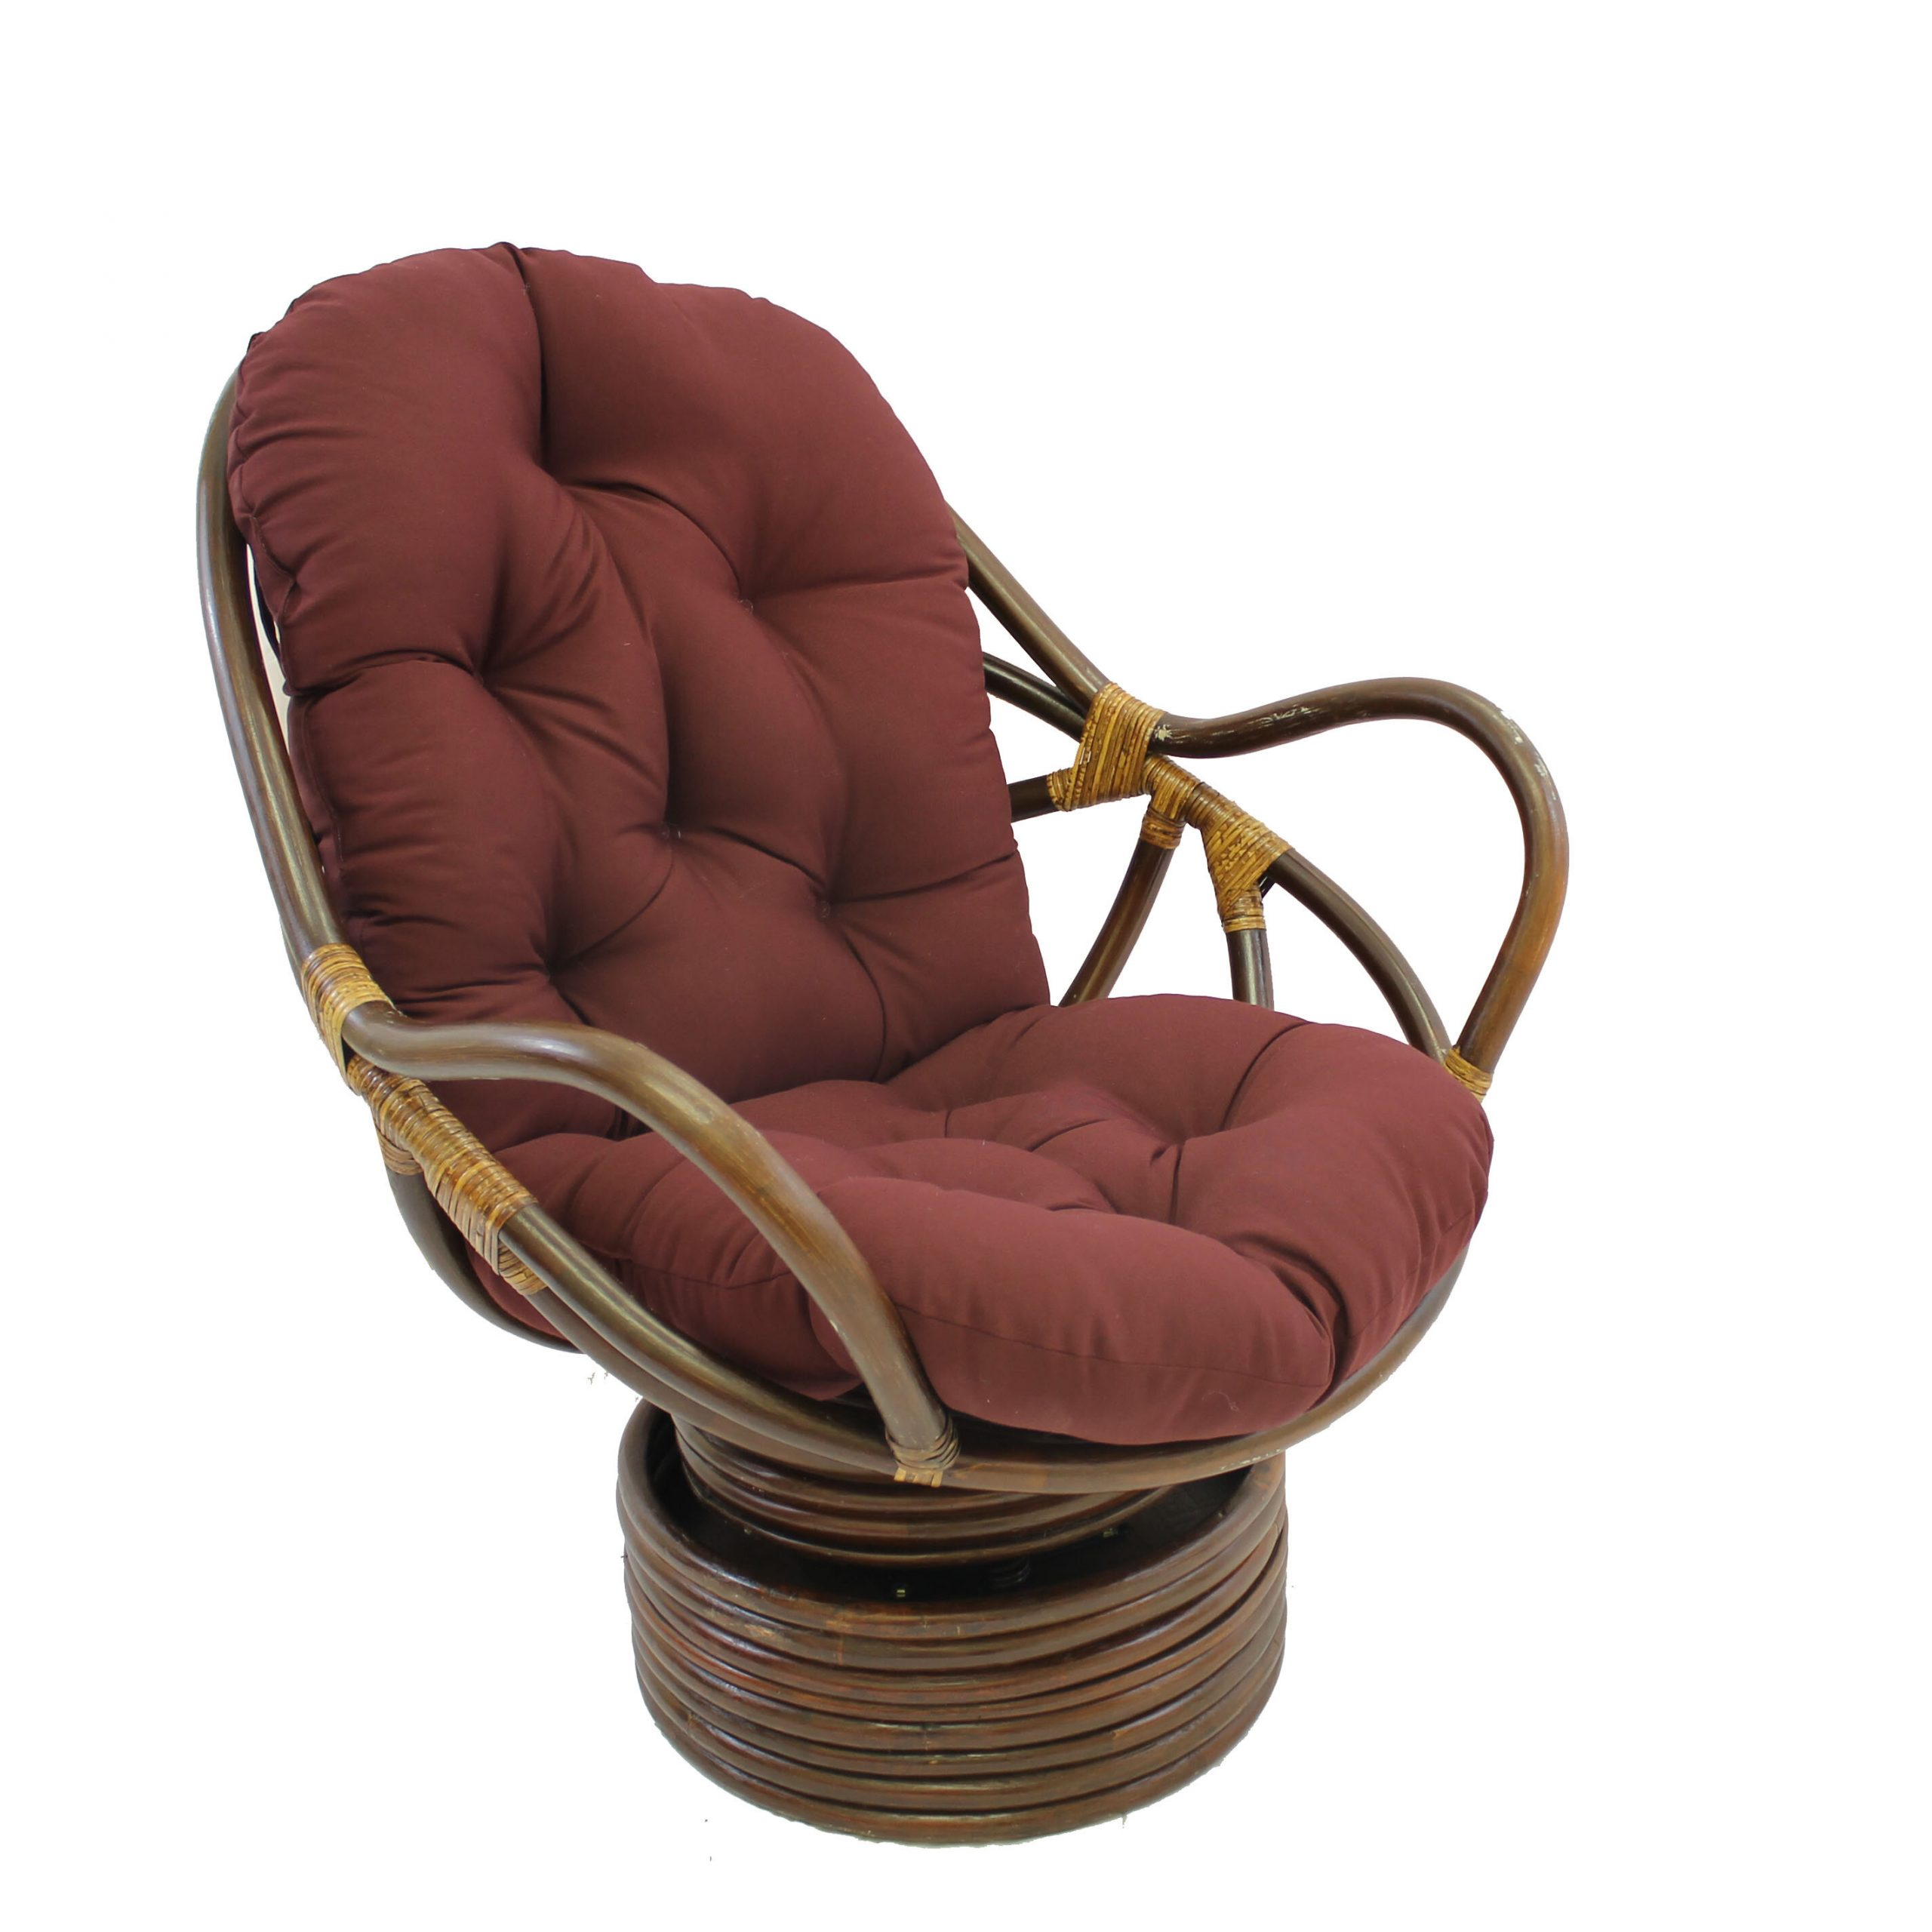 Bocanegra Papasan Chair For Orndorff Tufted Papasan Chairs (View 9 of 15)